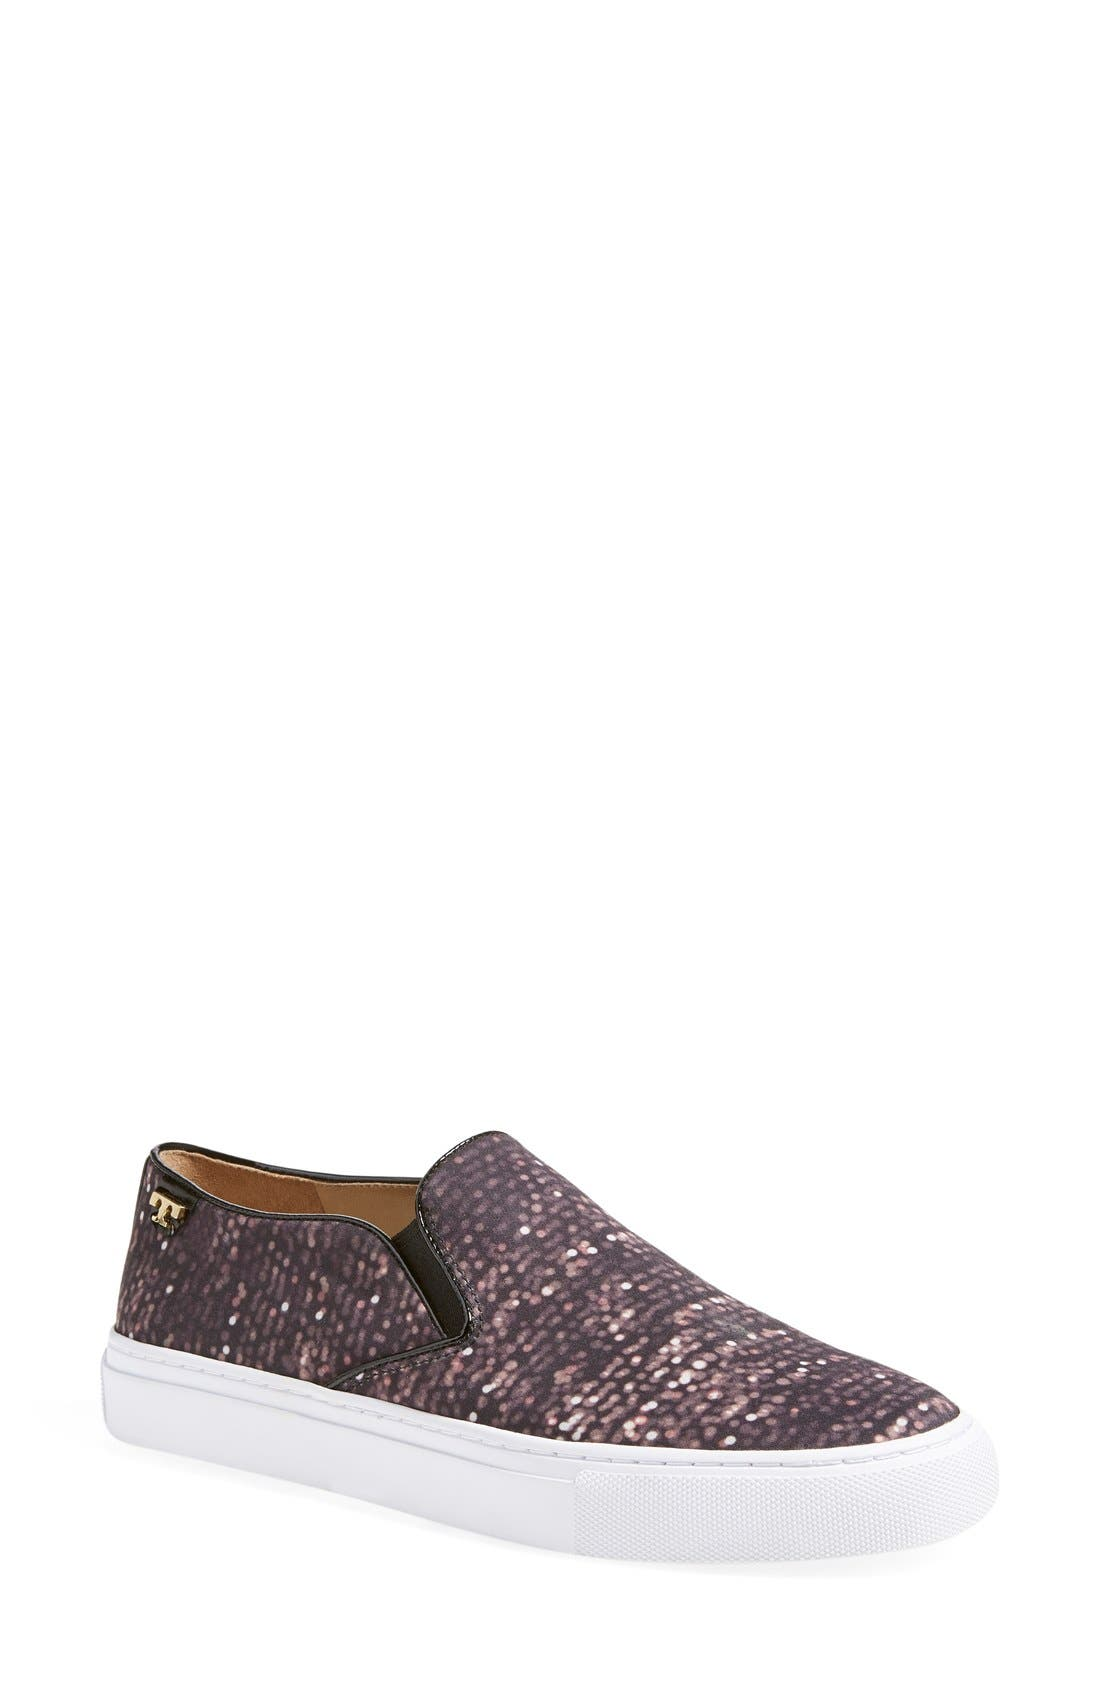 Main Image - Tory Burch Print Slip-On Sneaker (Women)